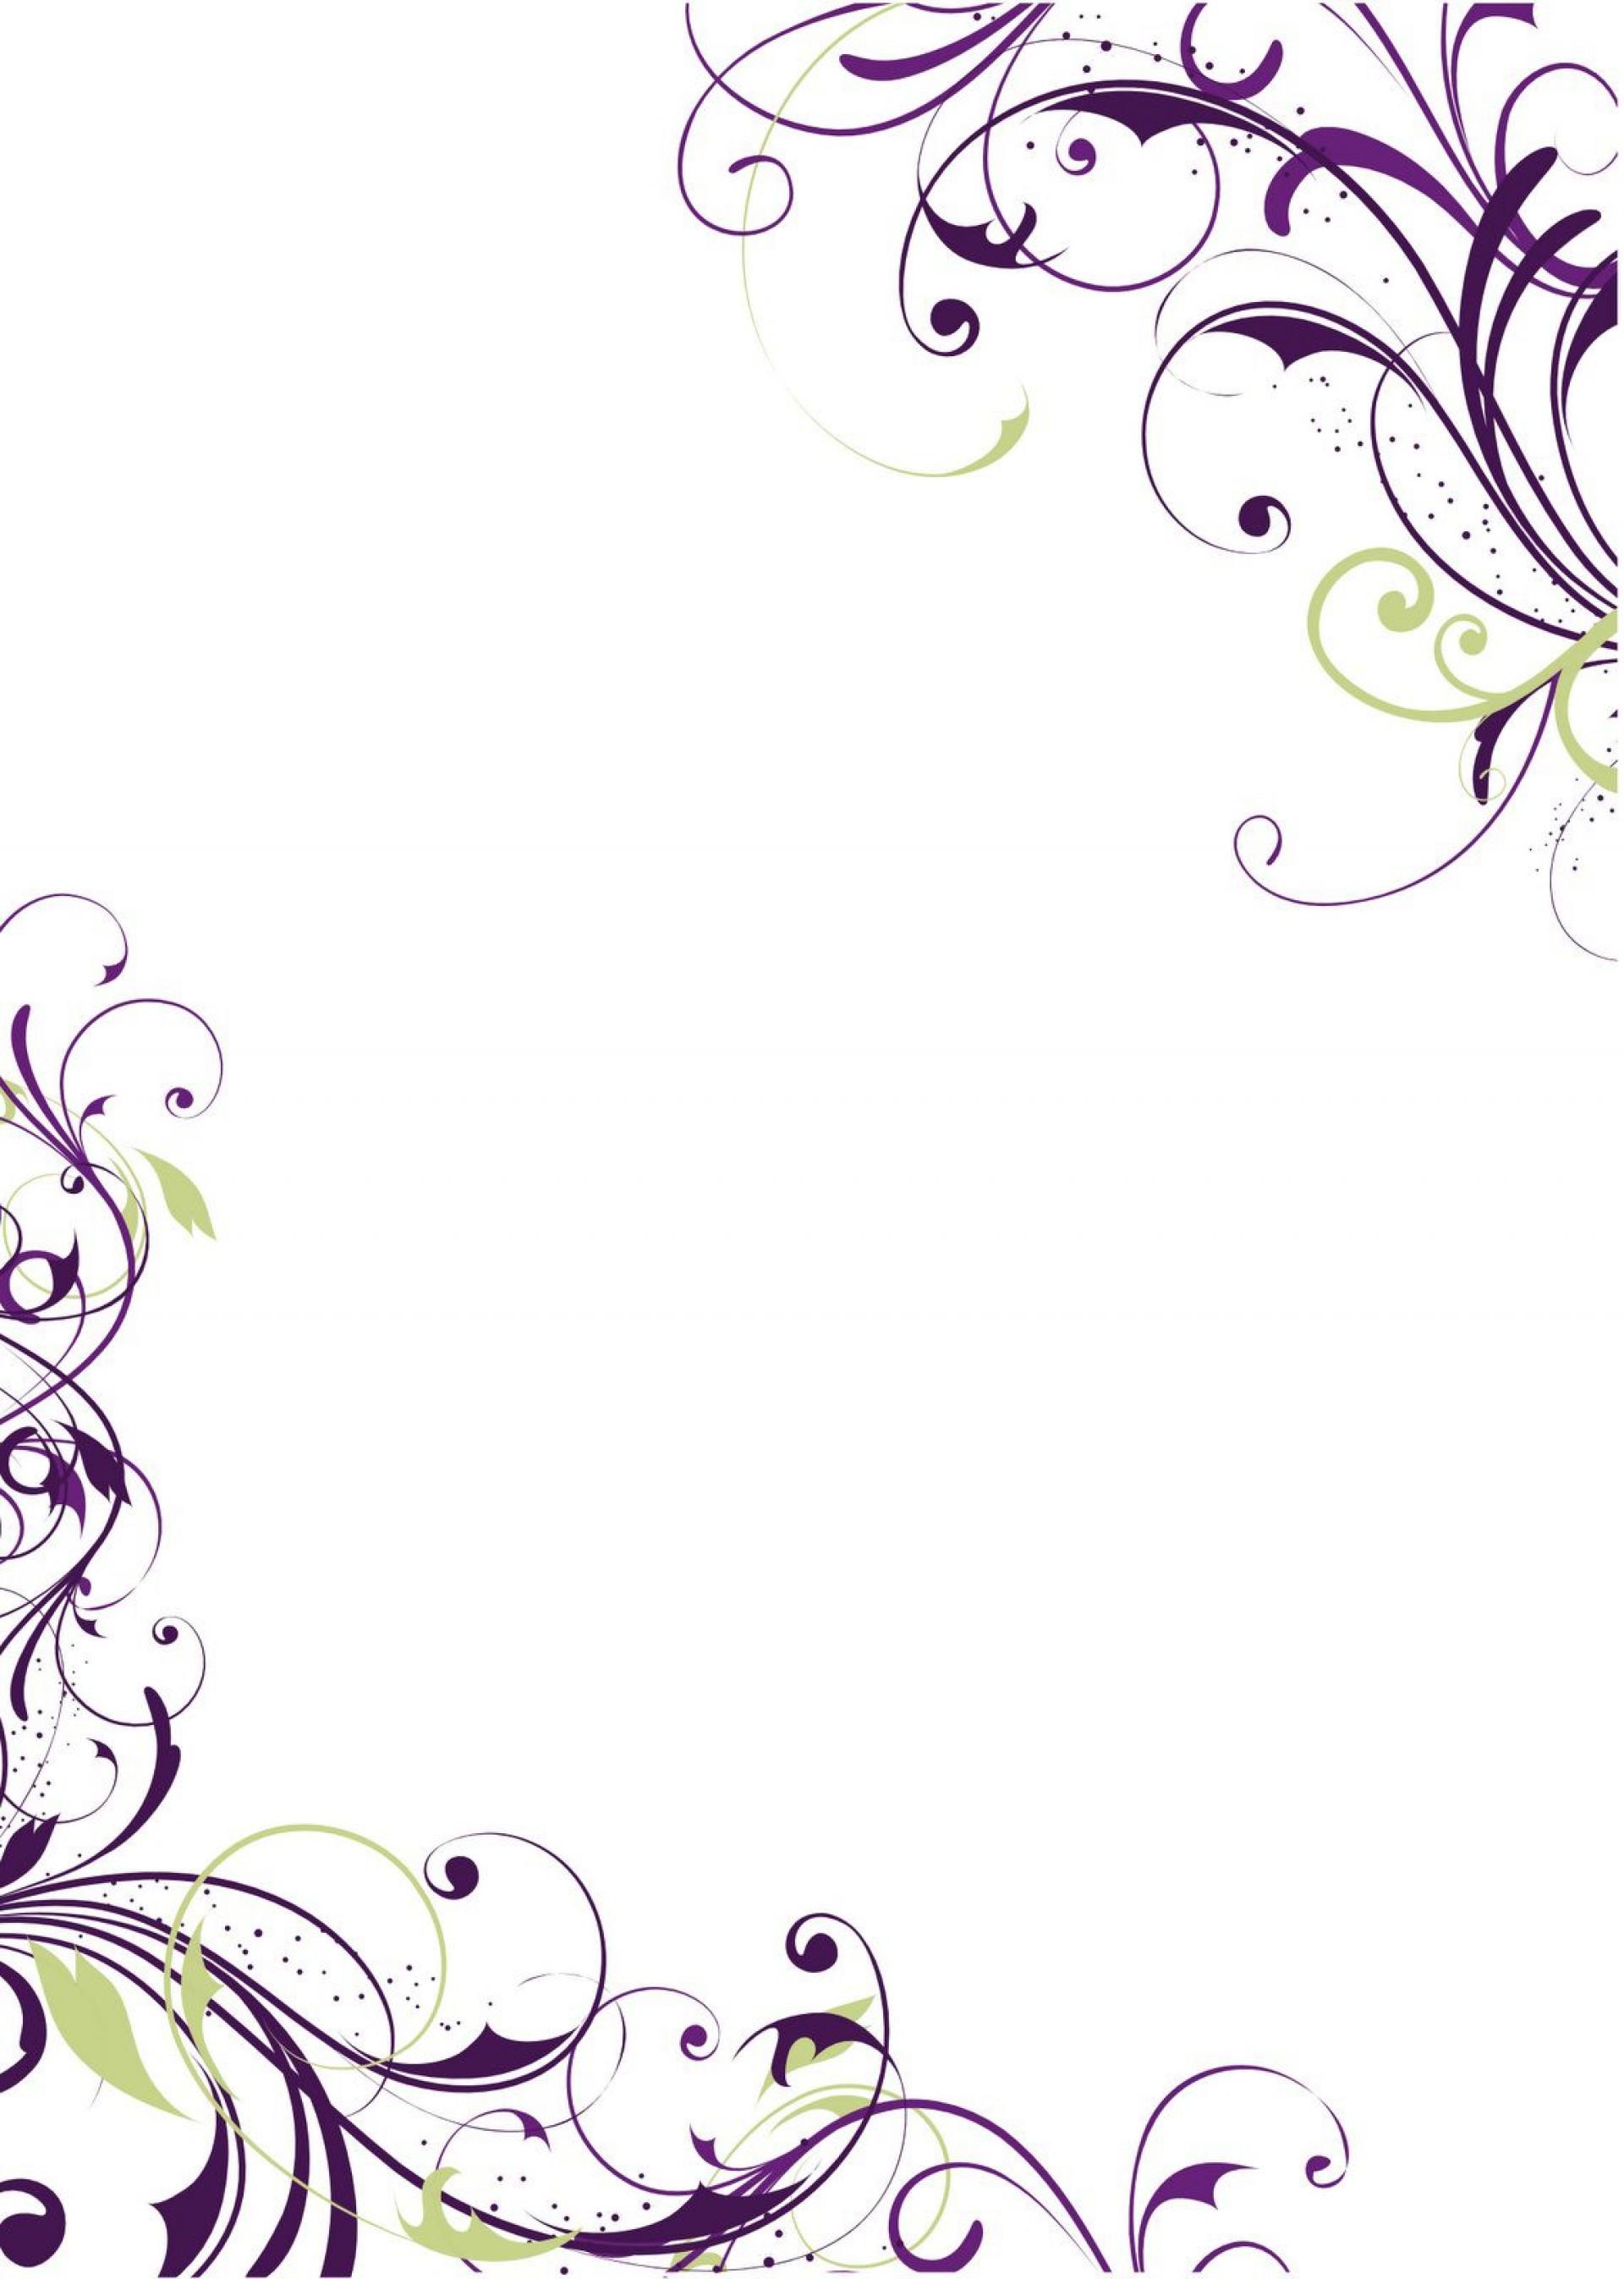 004 Surprising Blank Wedding Invitation Template High Resolution  Templates Free Download Printable Royal Blue1920